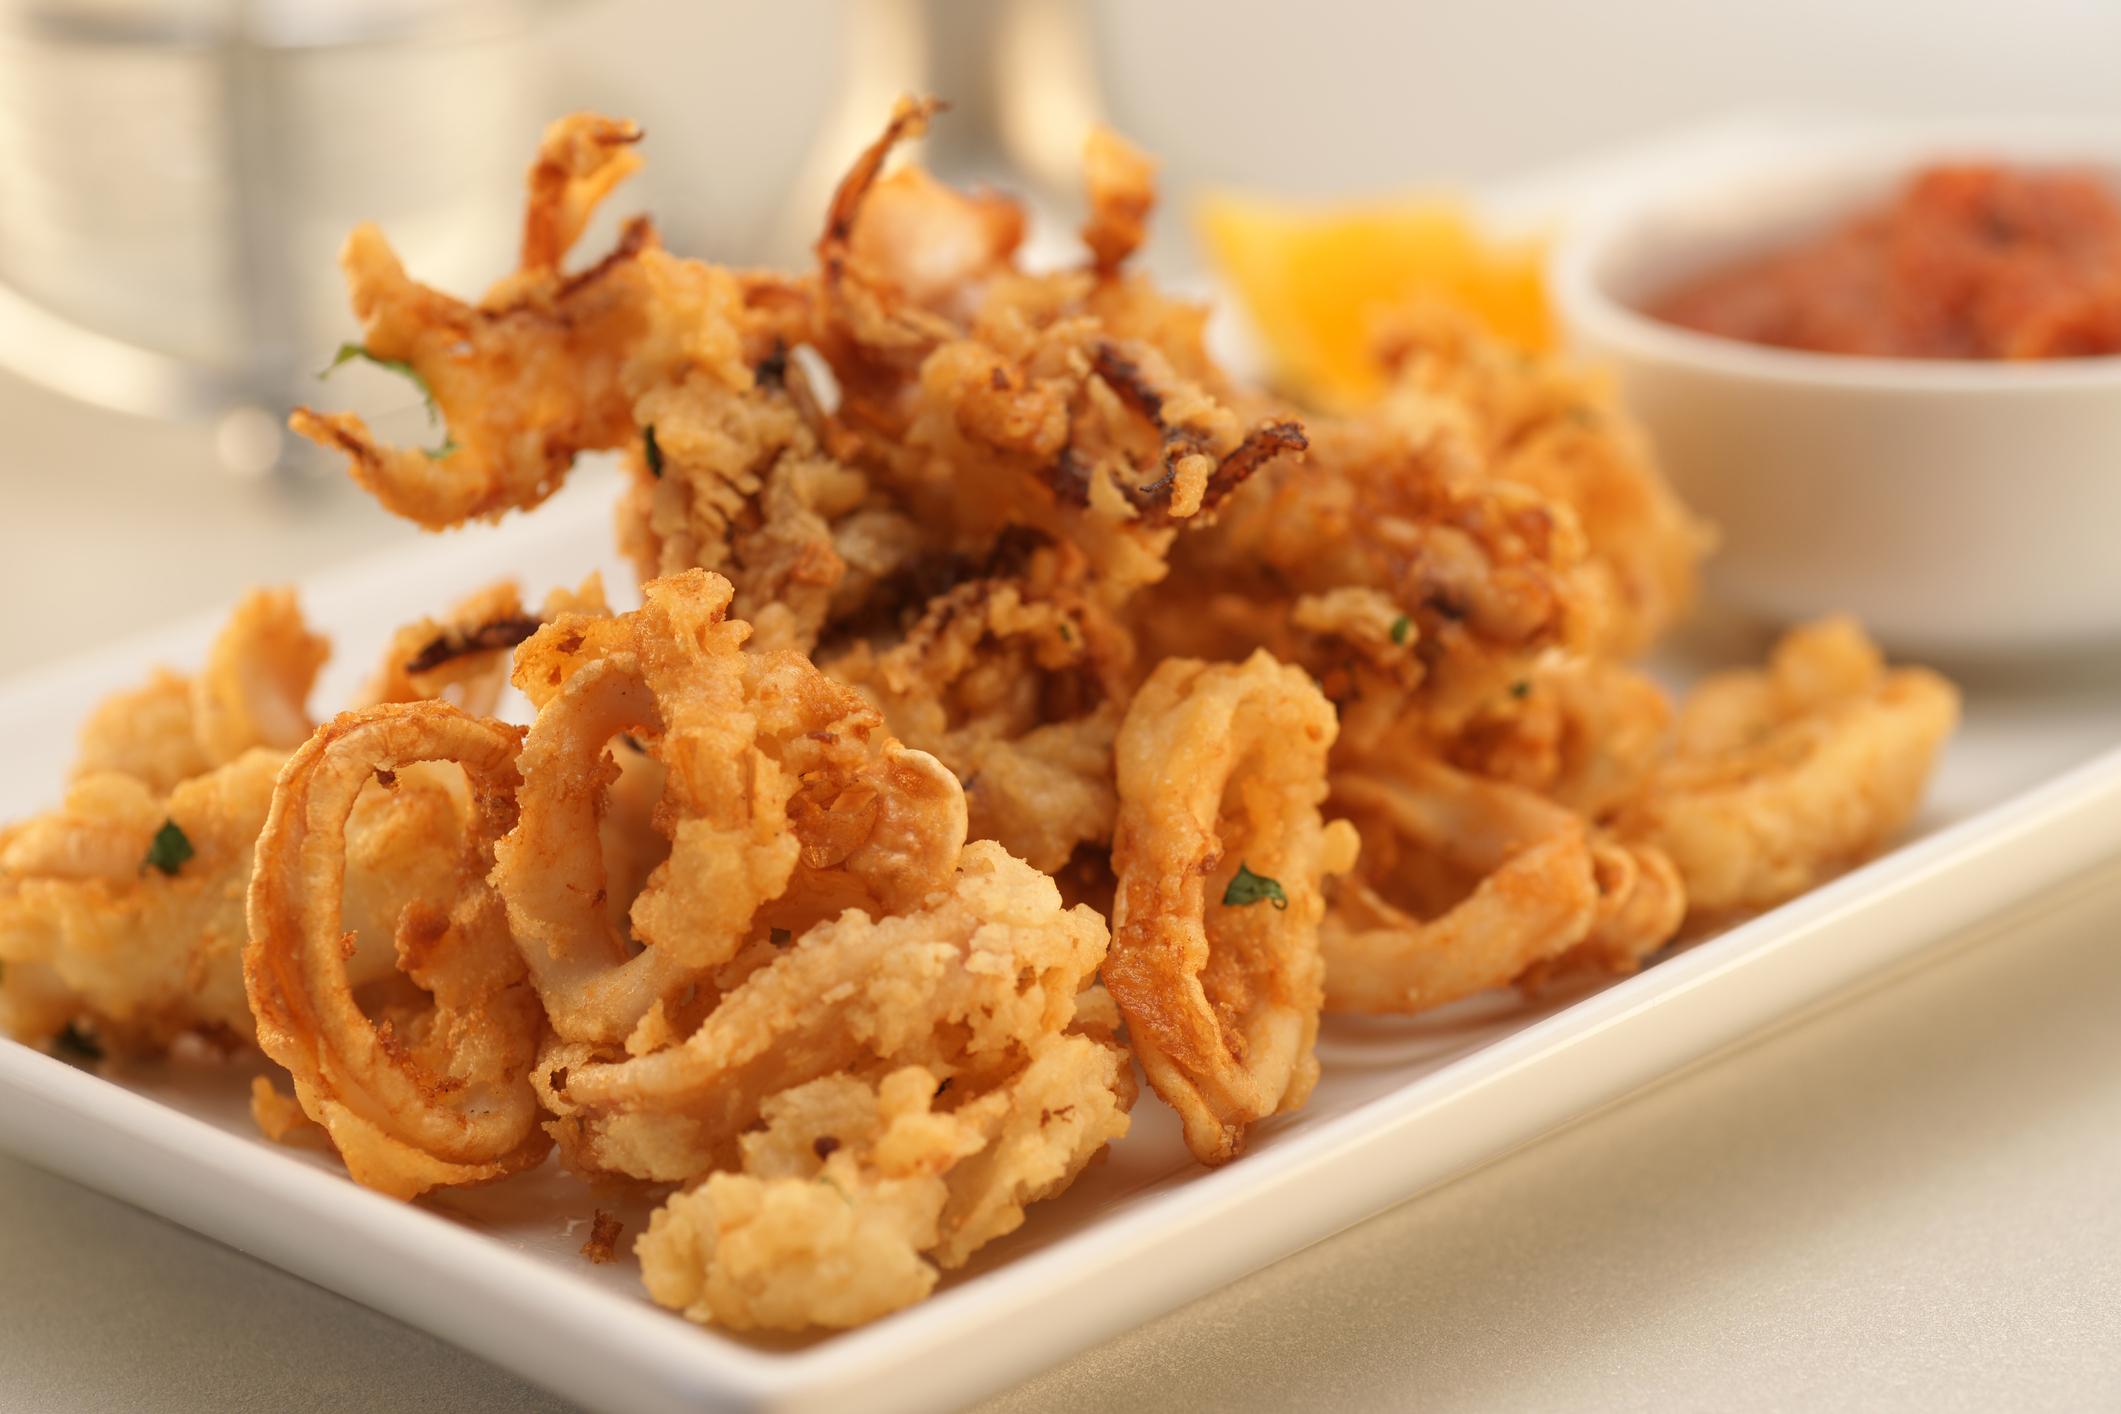 a white plate with fried calamari and marinara sauce